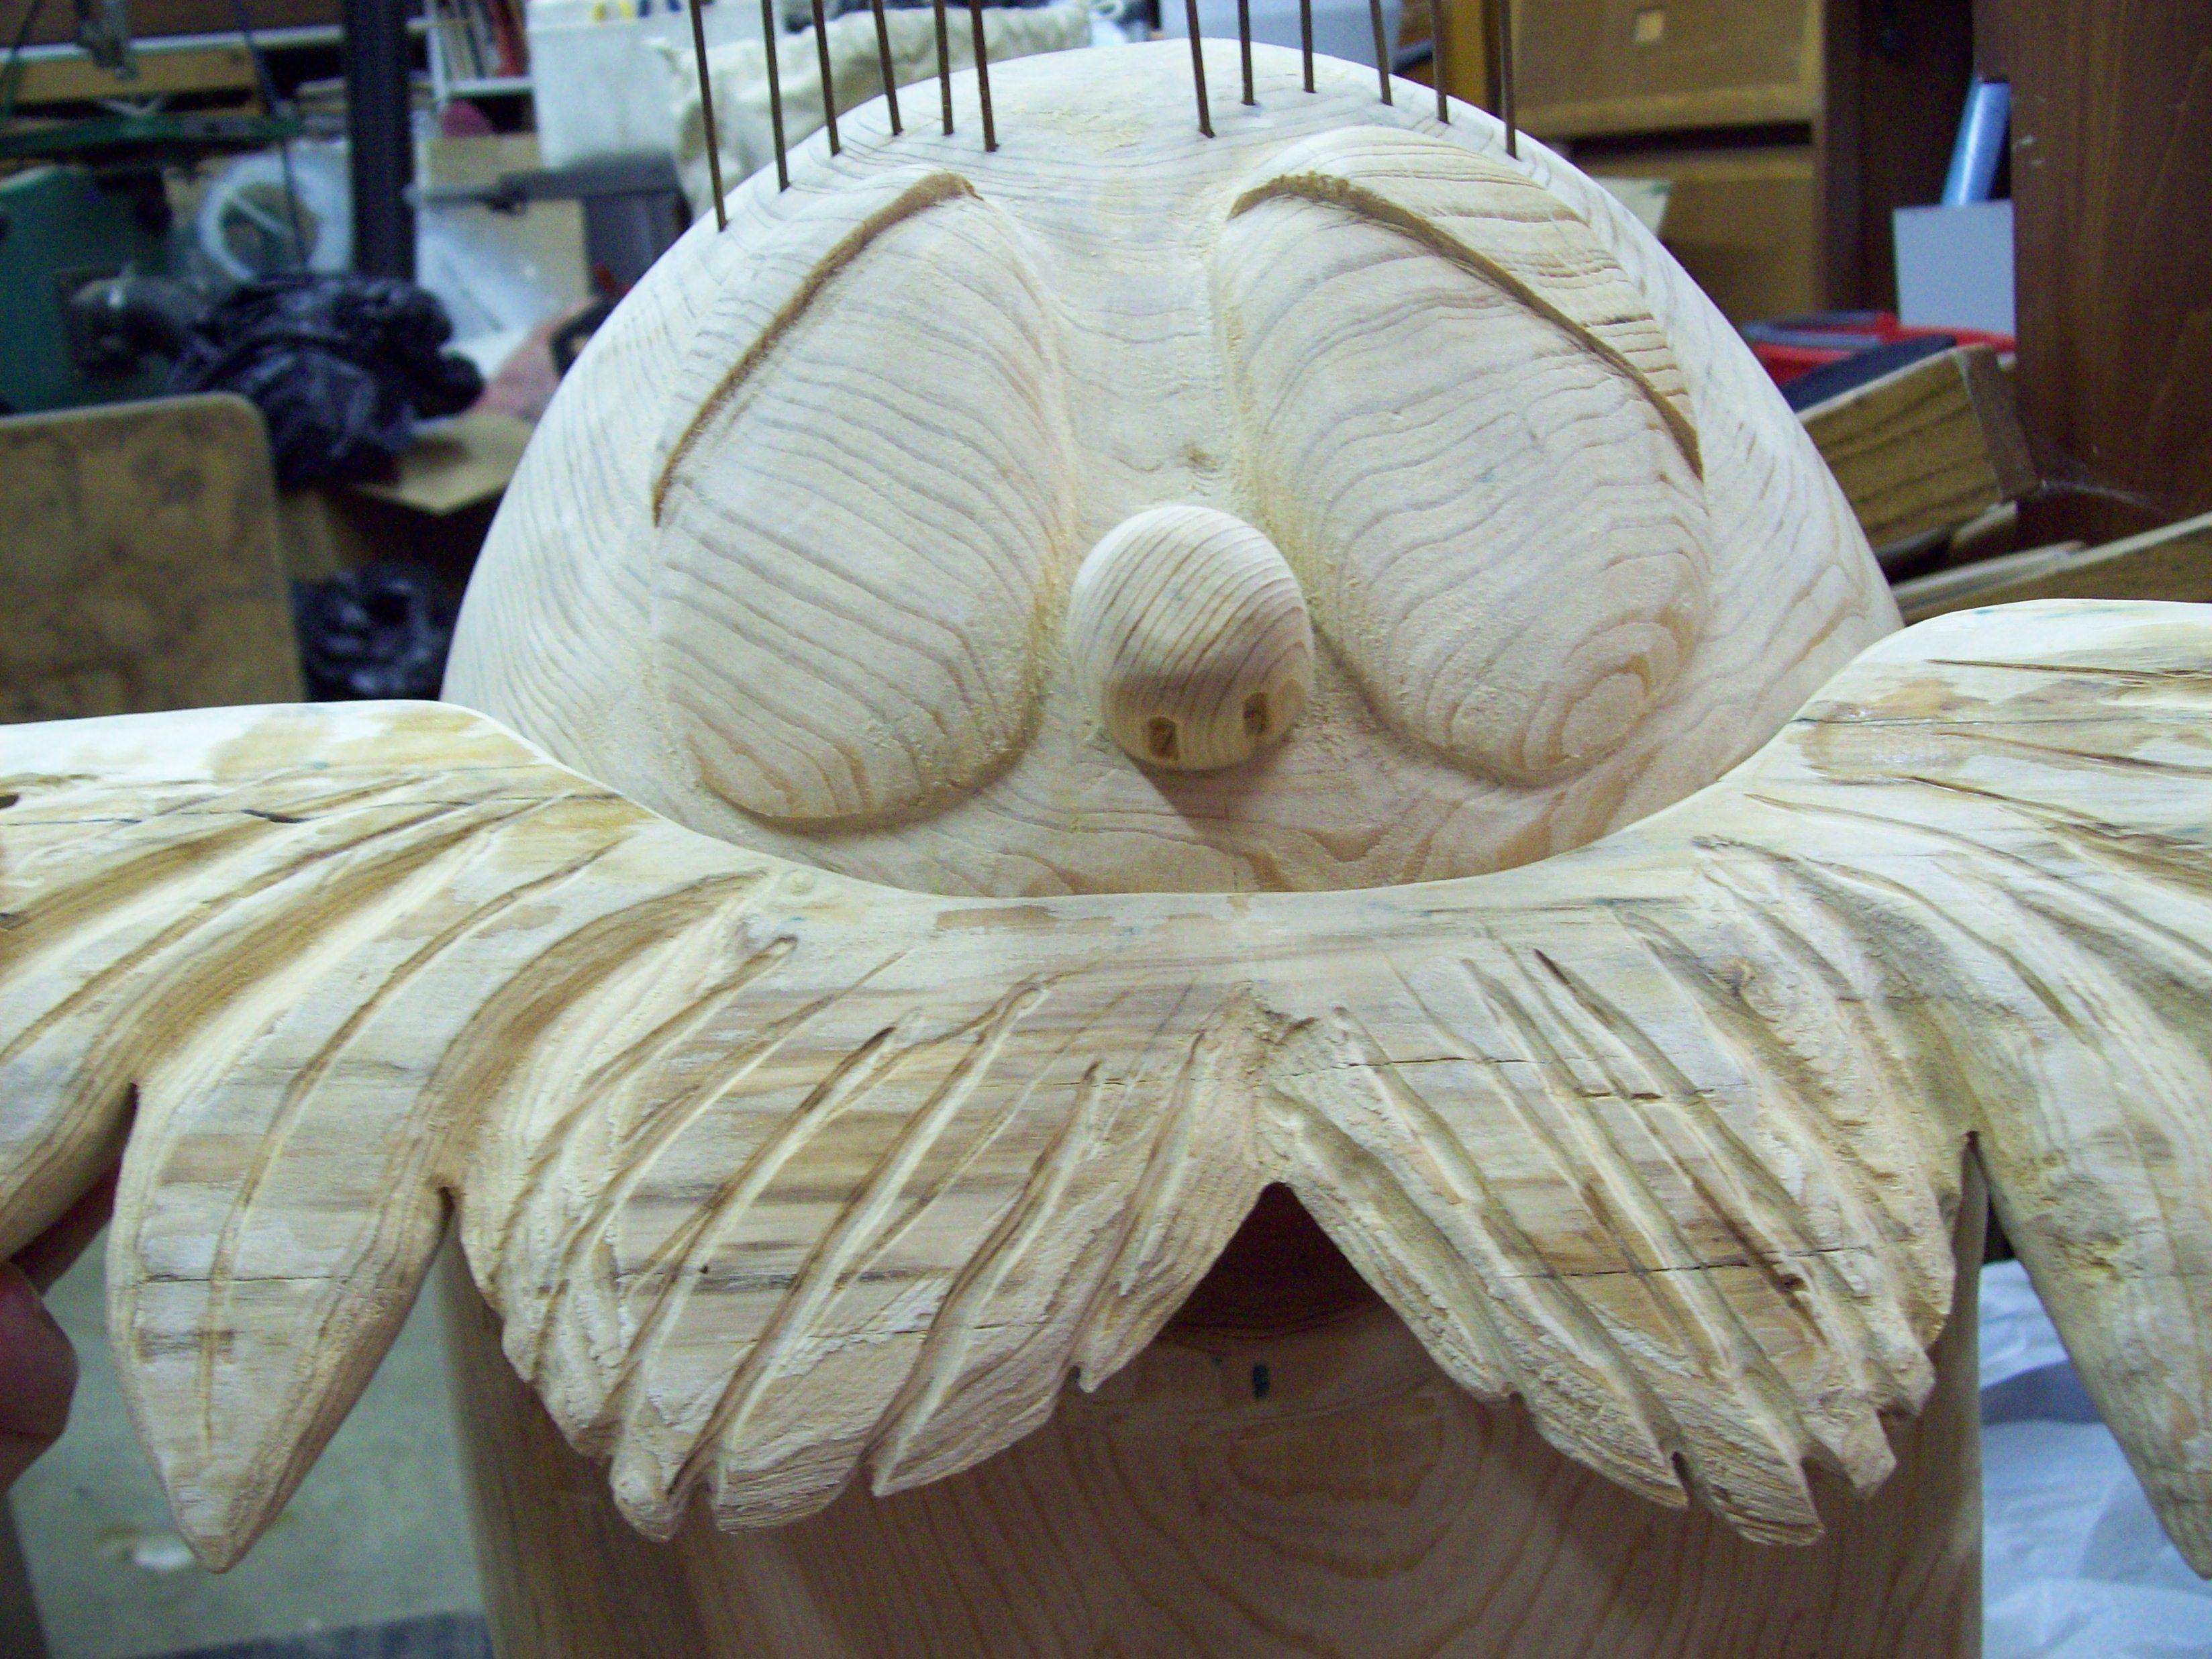 Lorax Carving 9